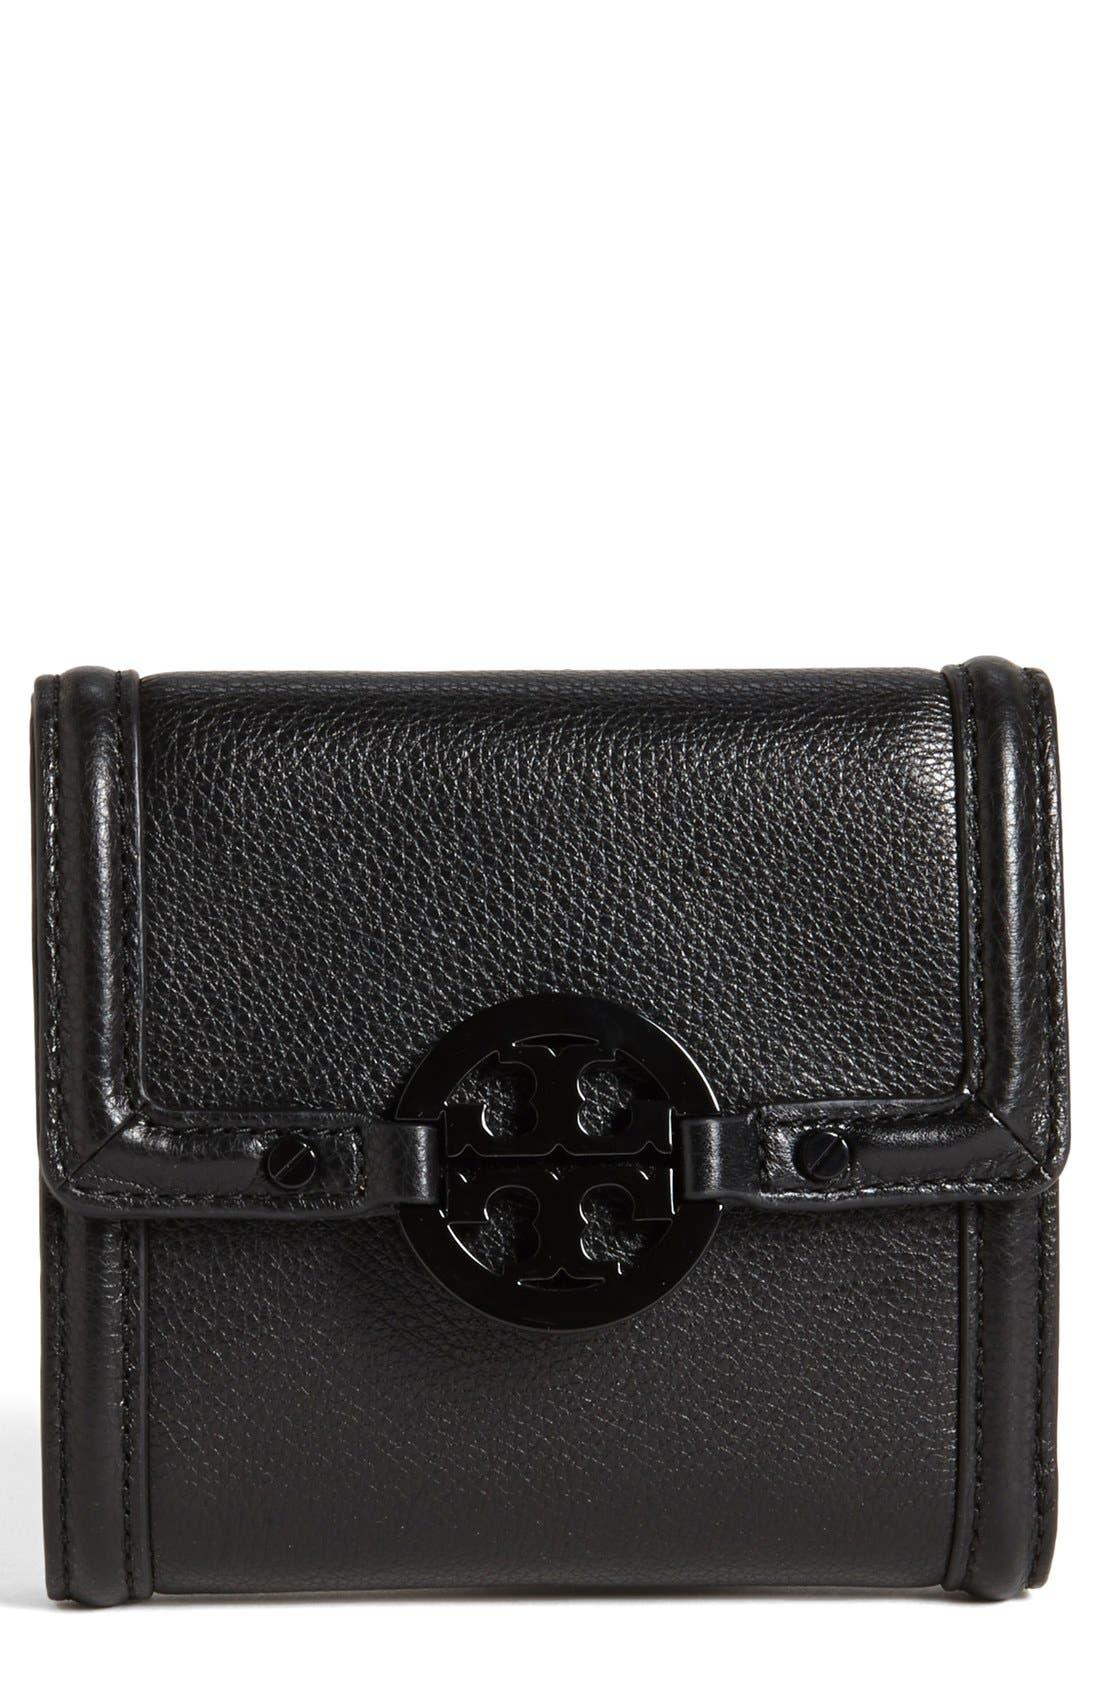 Main Image - Tory Burch 'Amanda' Trifold French Wallet